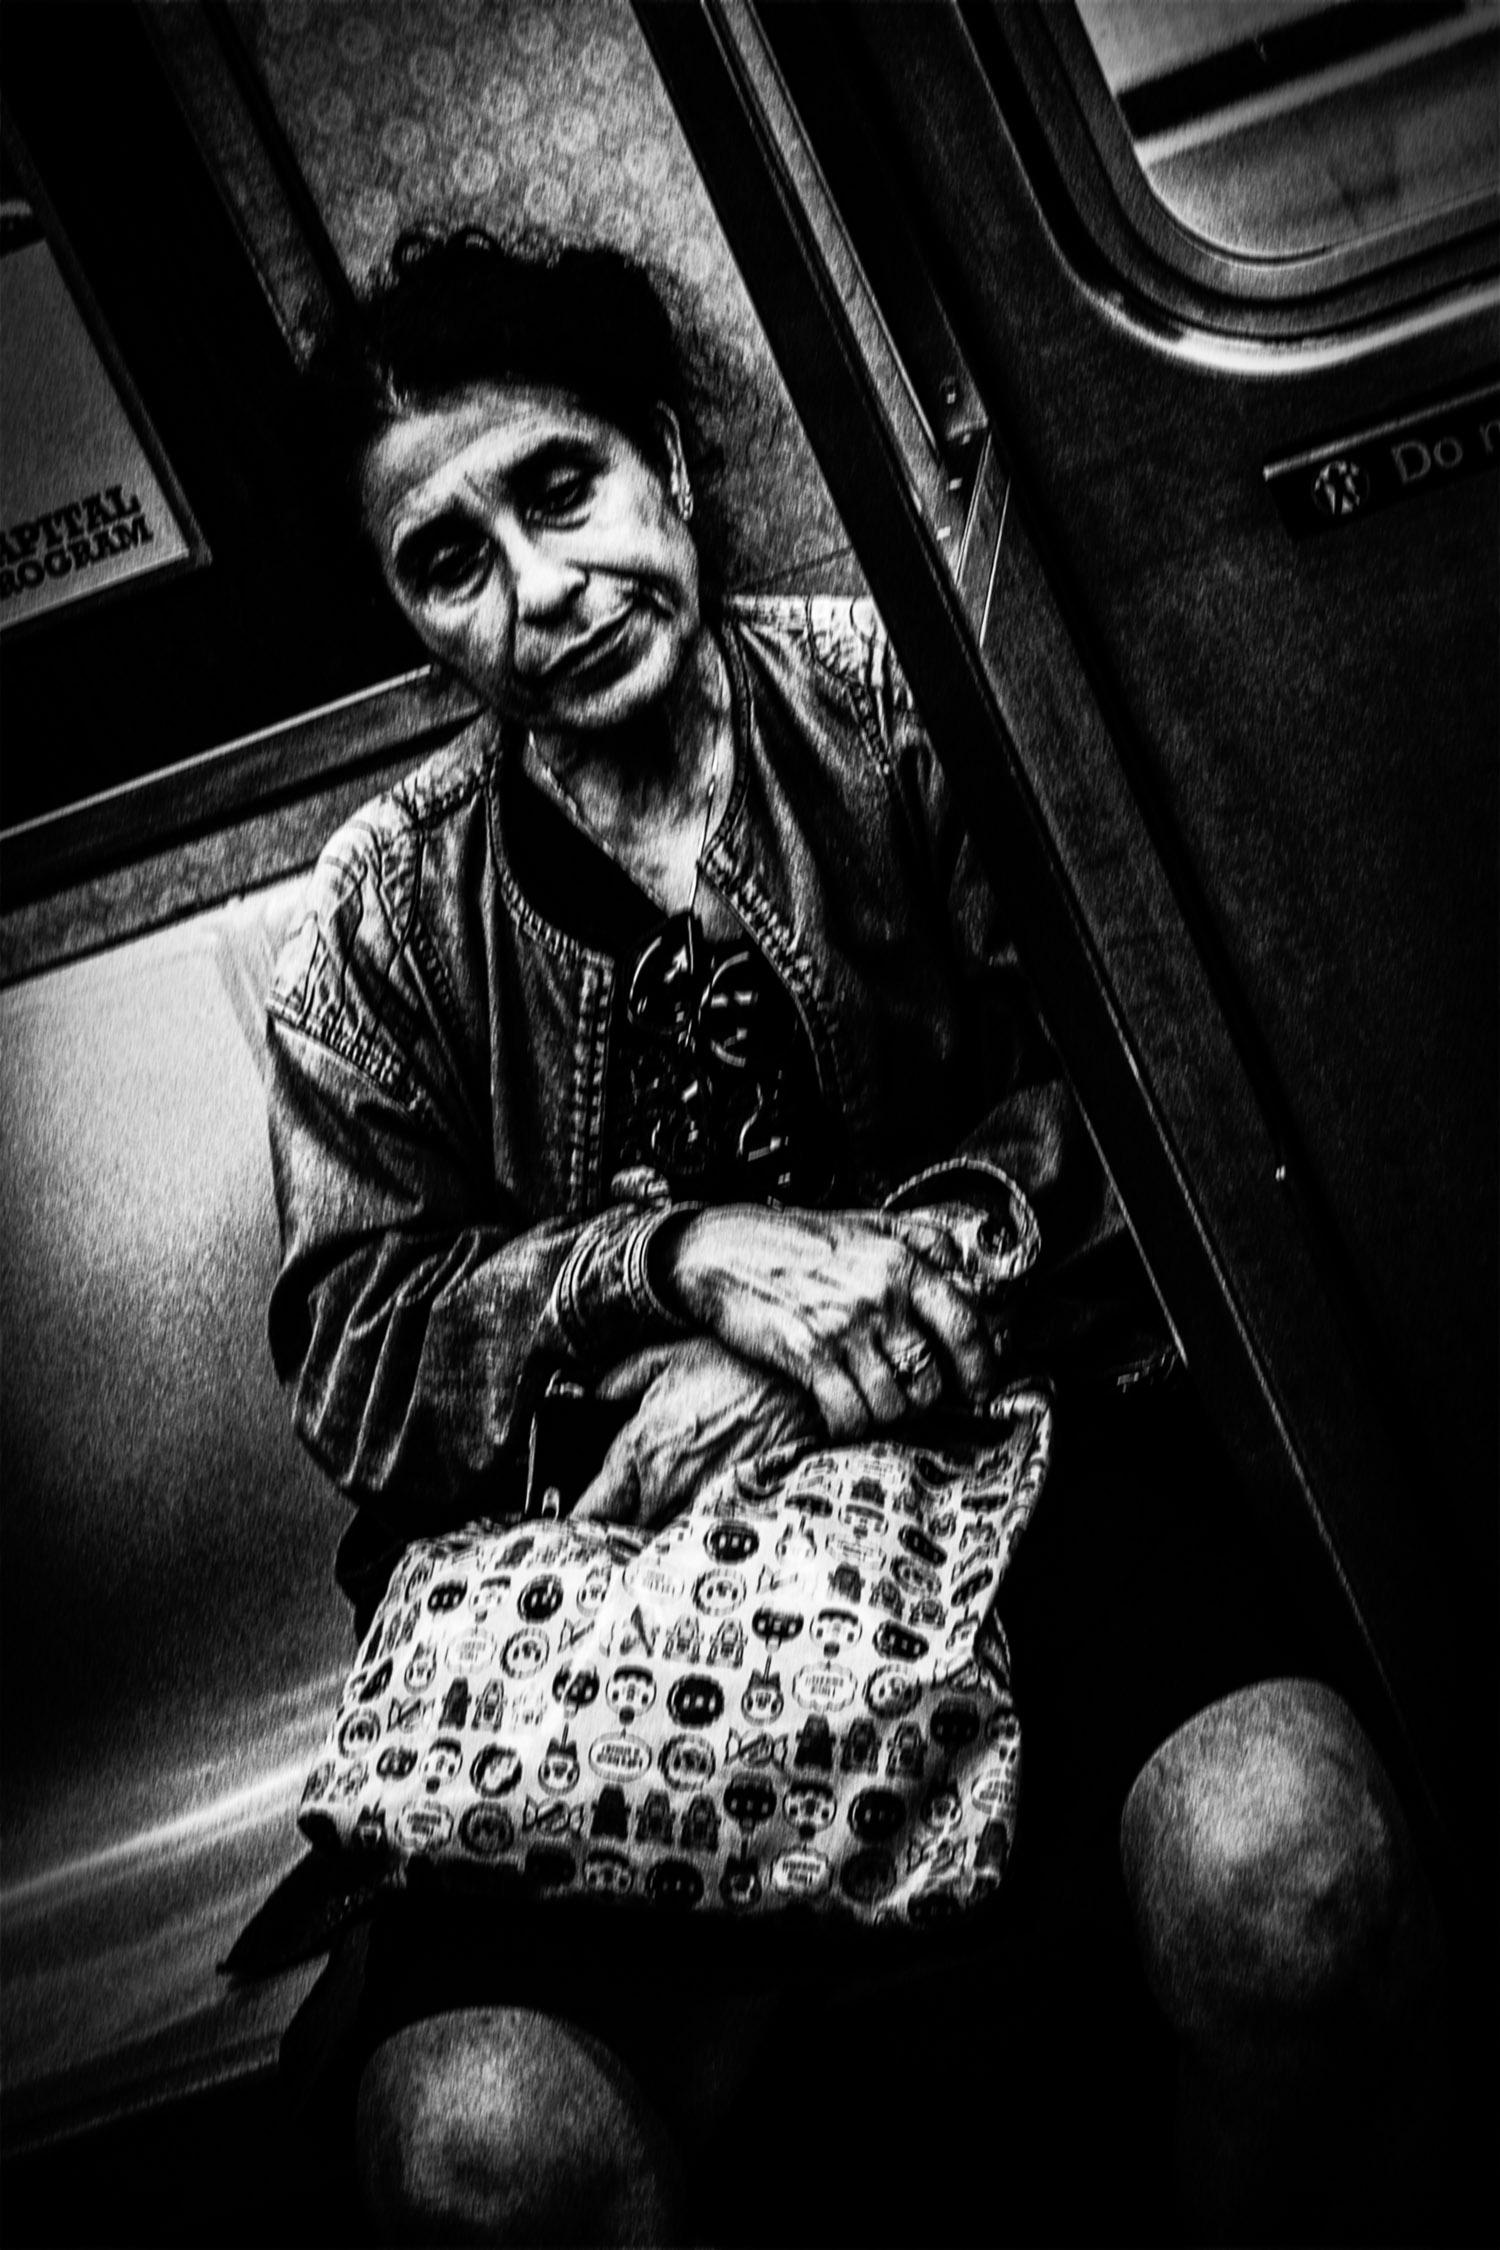 subway-40x26.6_.jpg